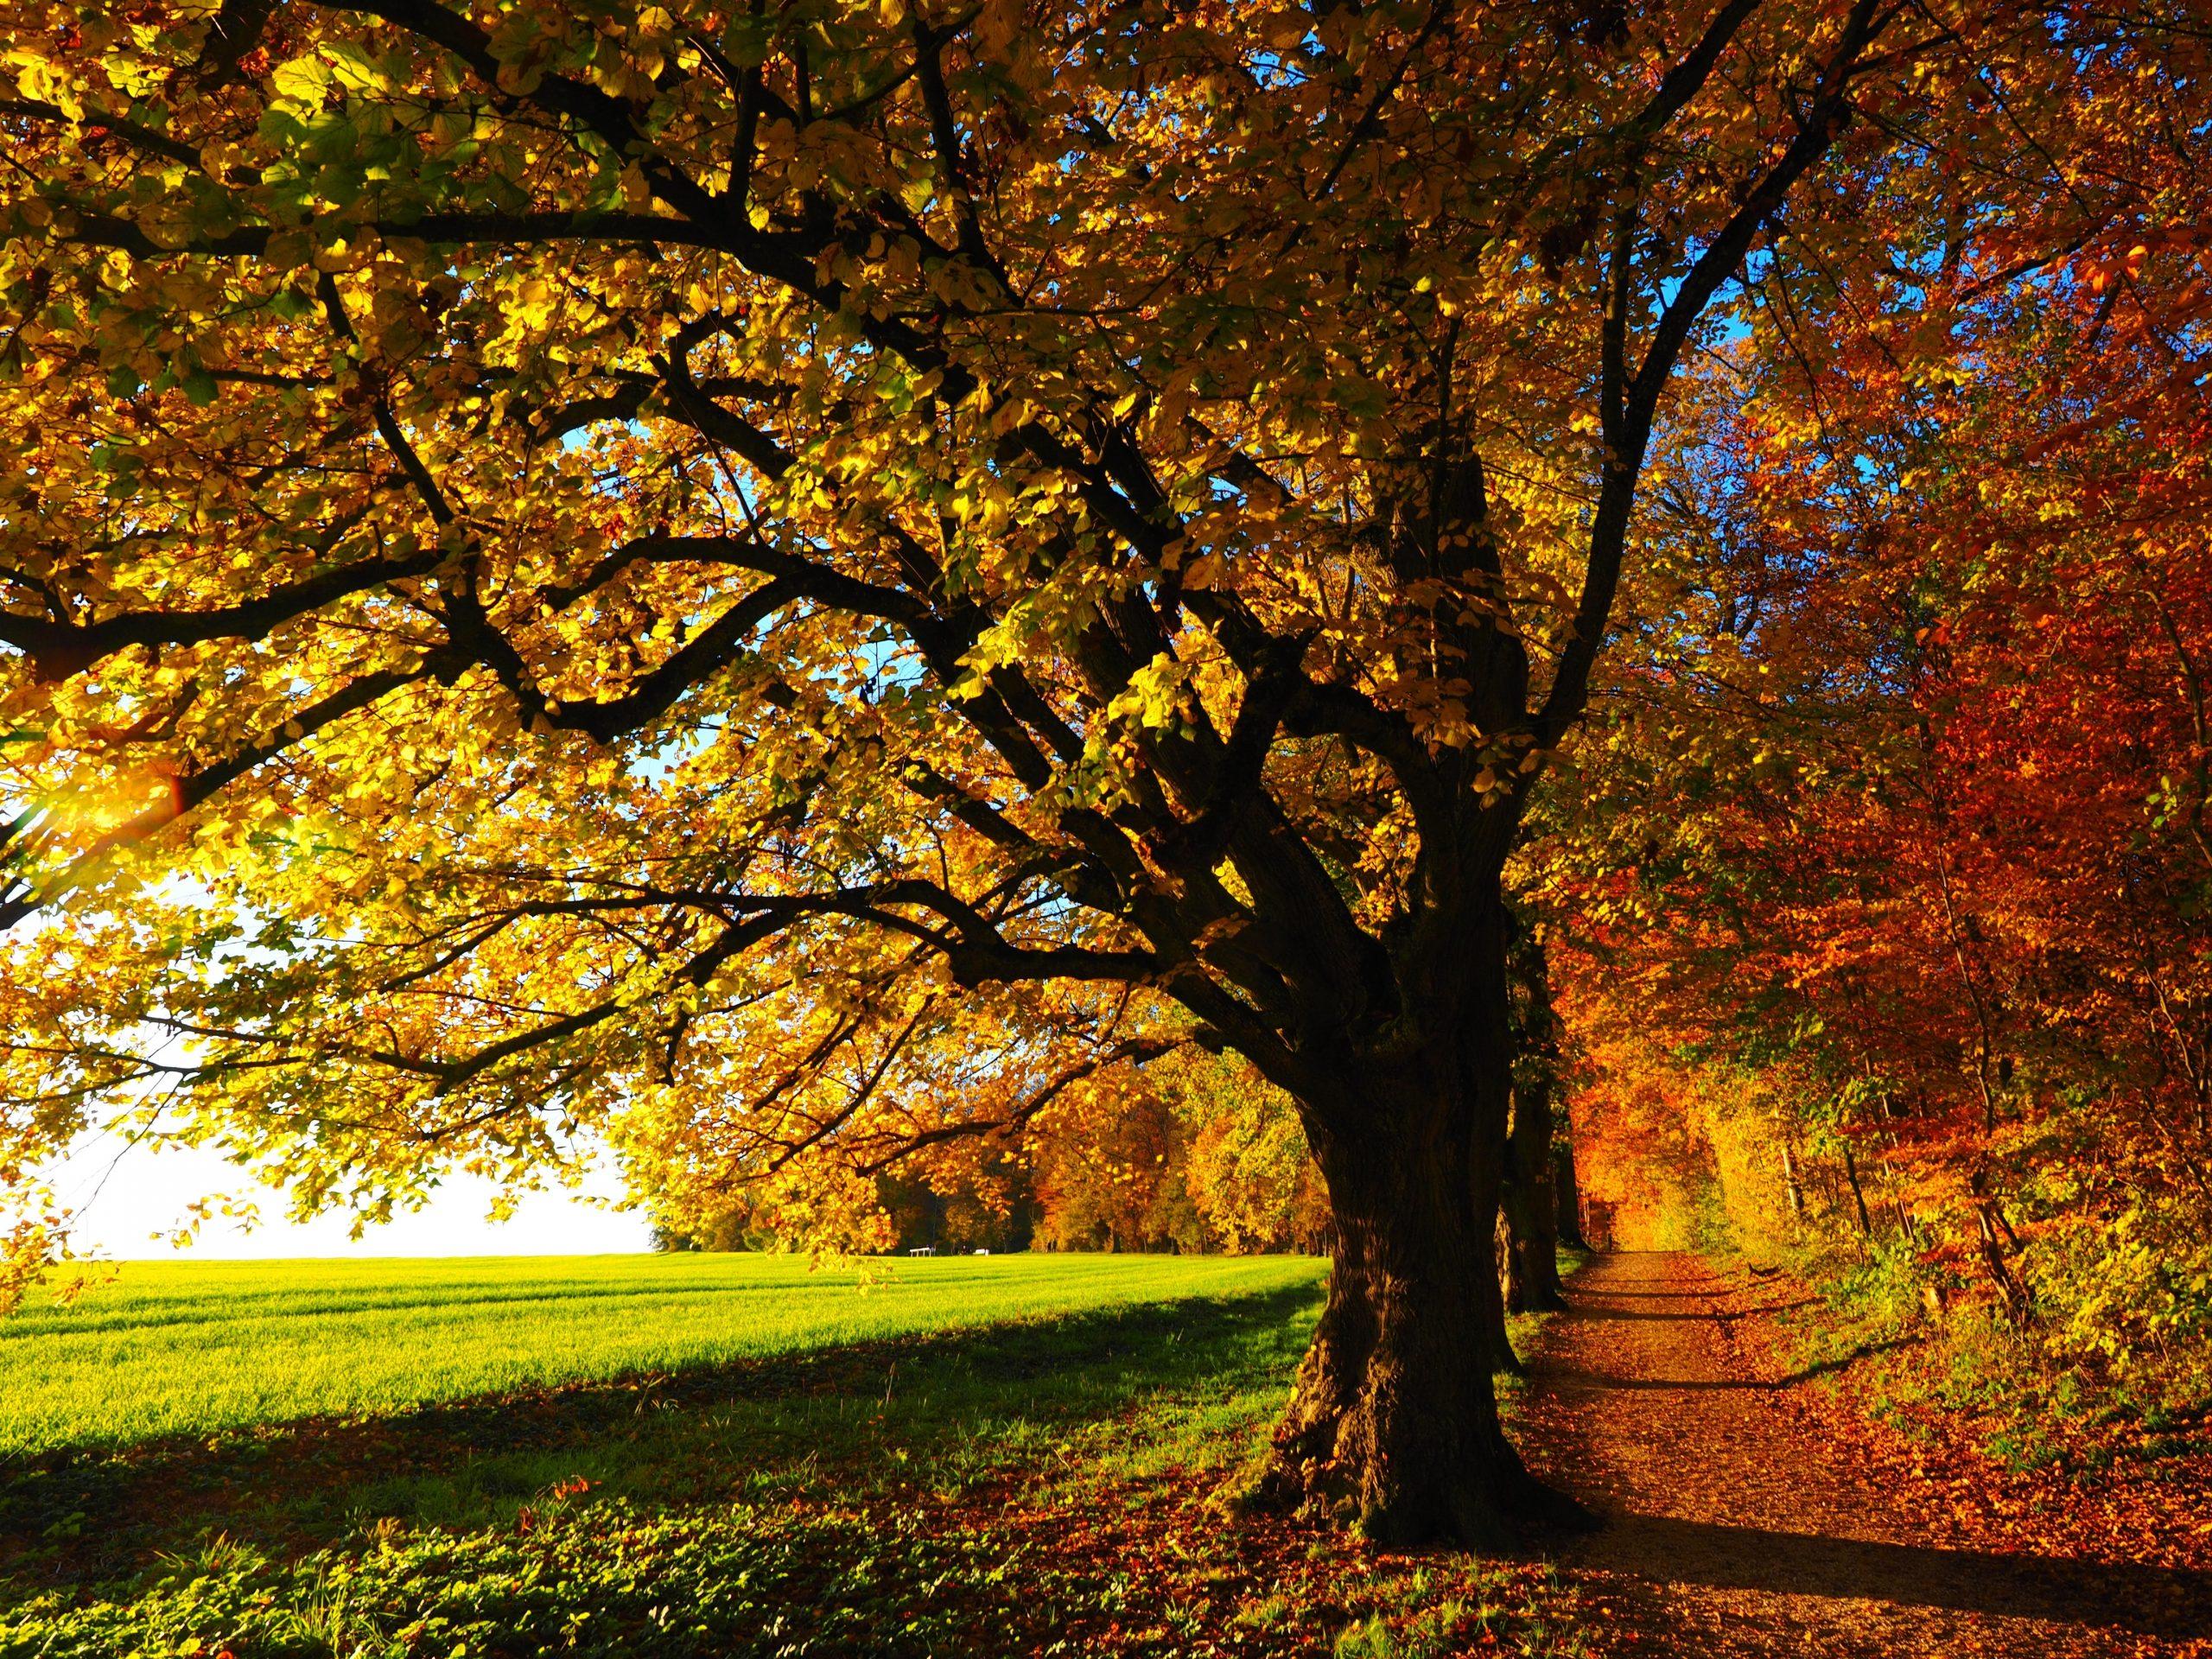 autumn-autumn-mood-colorful-edge-of-the-woods-35778